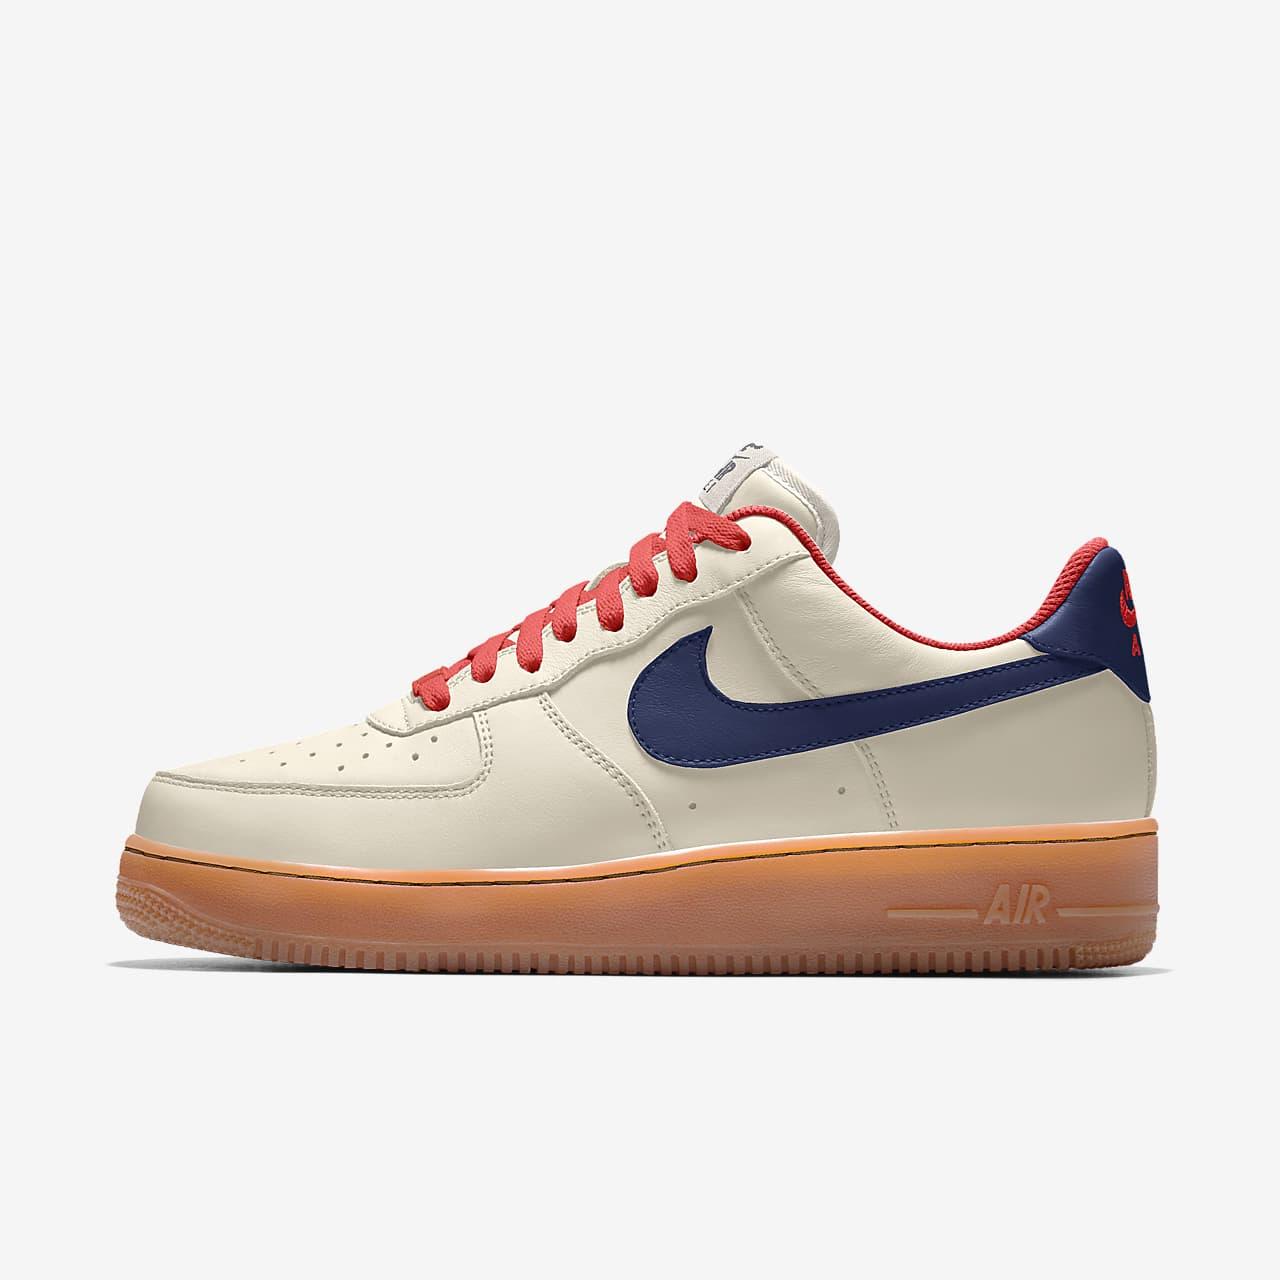 Nike Air Force 1 低筒 By You 專屬訂製女鞋